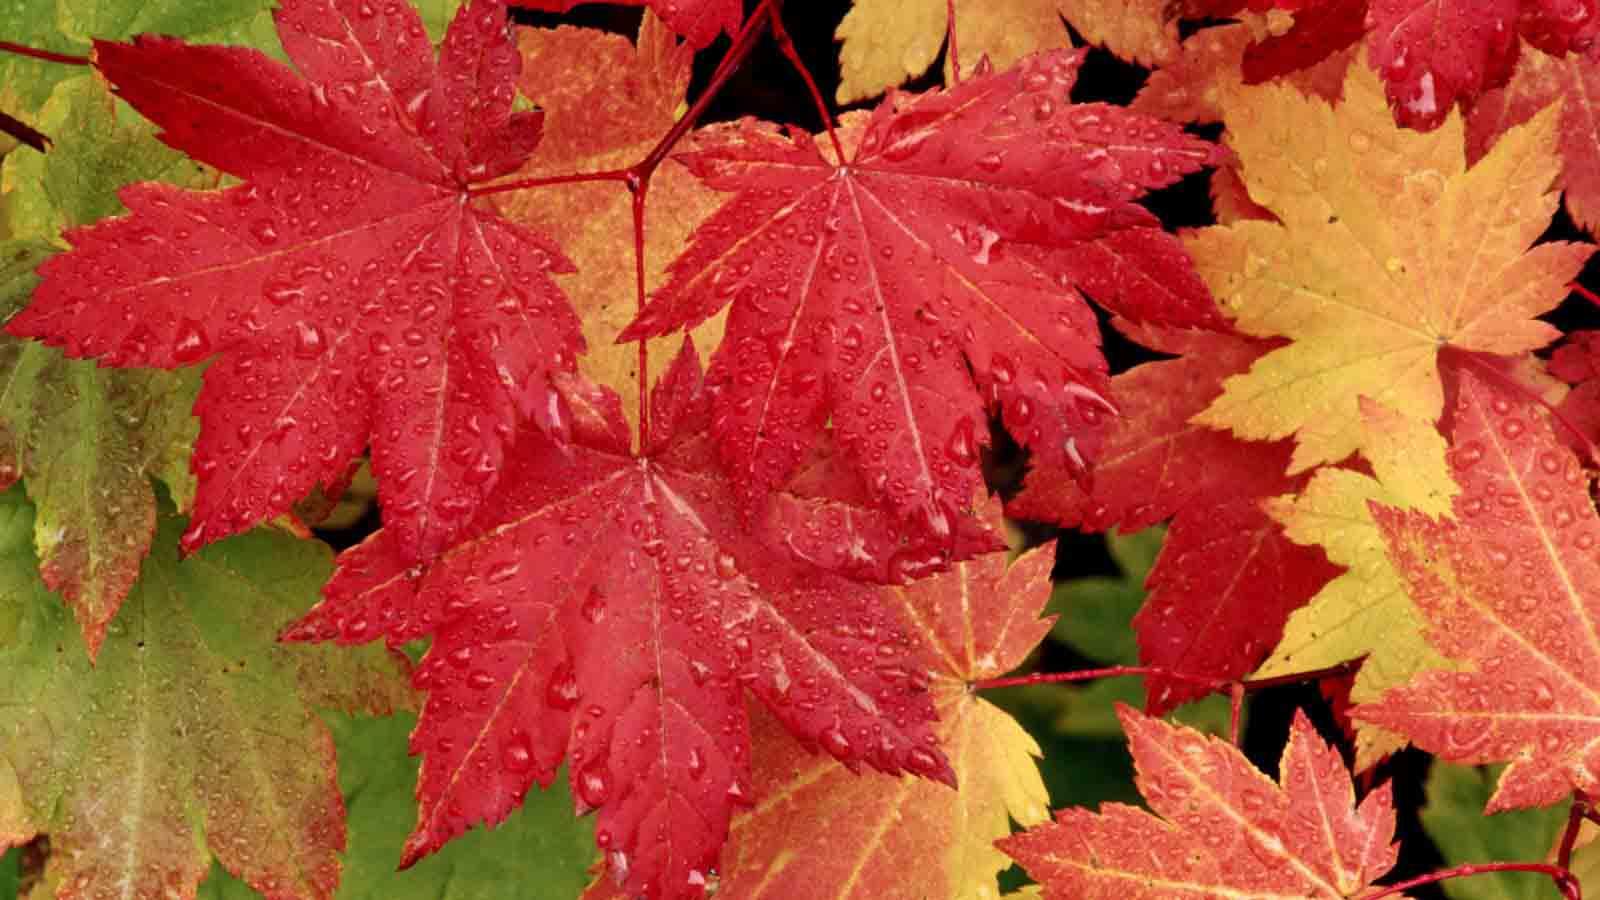 20 Latest Autumn Maple Leaves Hd Wallpaper 2011 - Maple Leaf Facebook Background , HD Wallpaper & Backgrounds